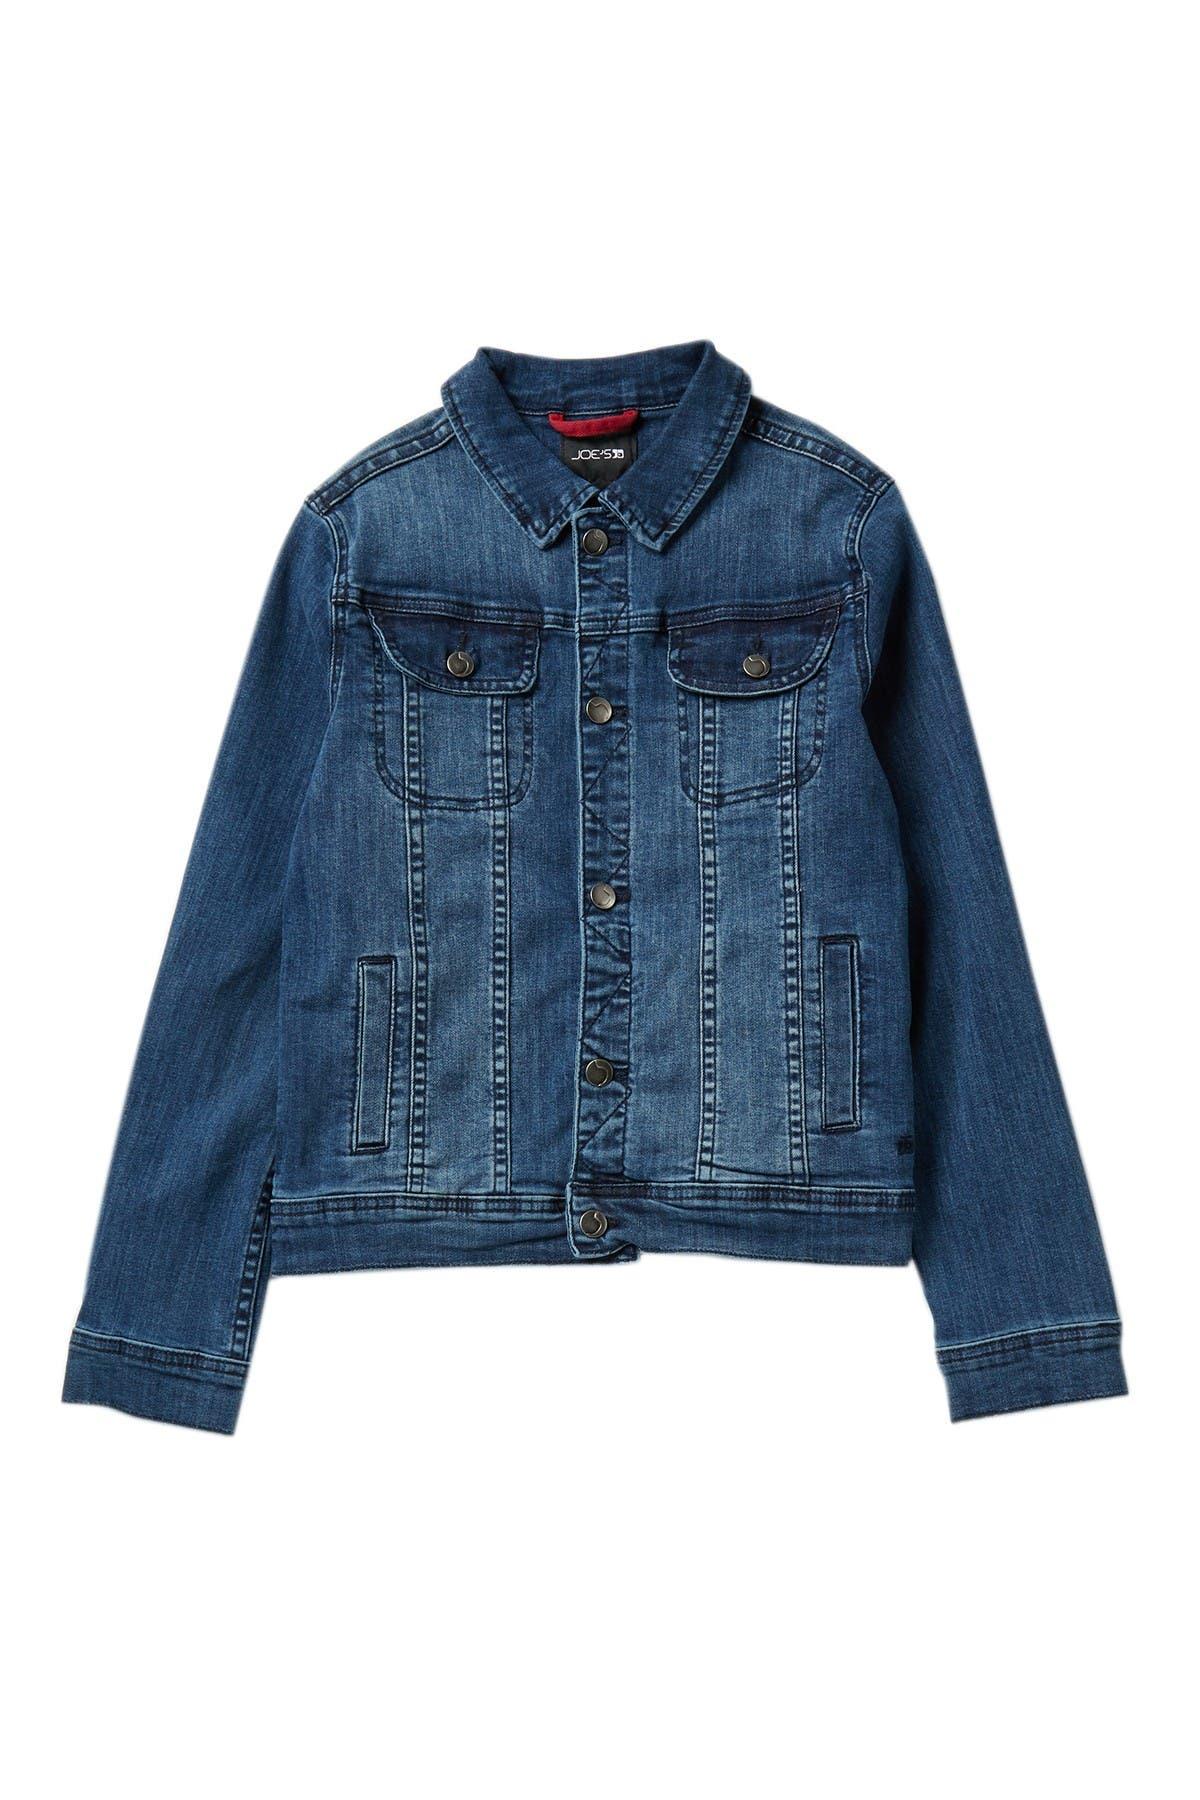 Image of Joe's Jeans Icon Denim Jacket